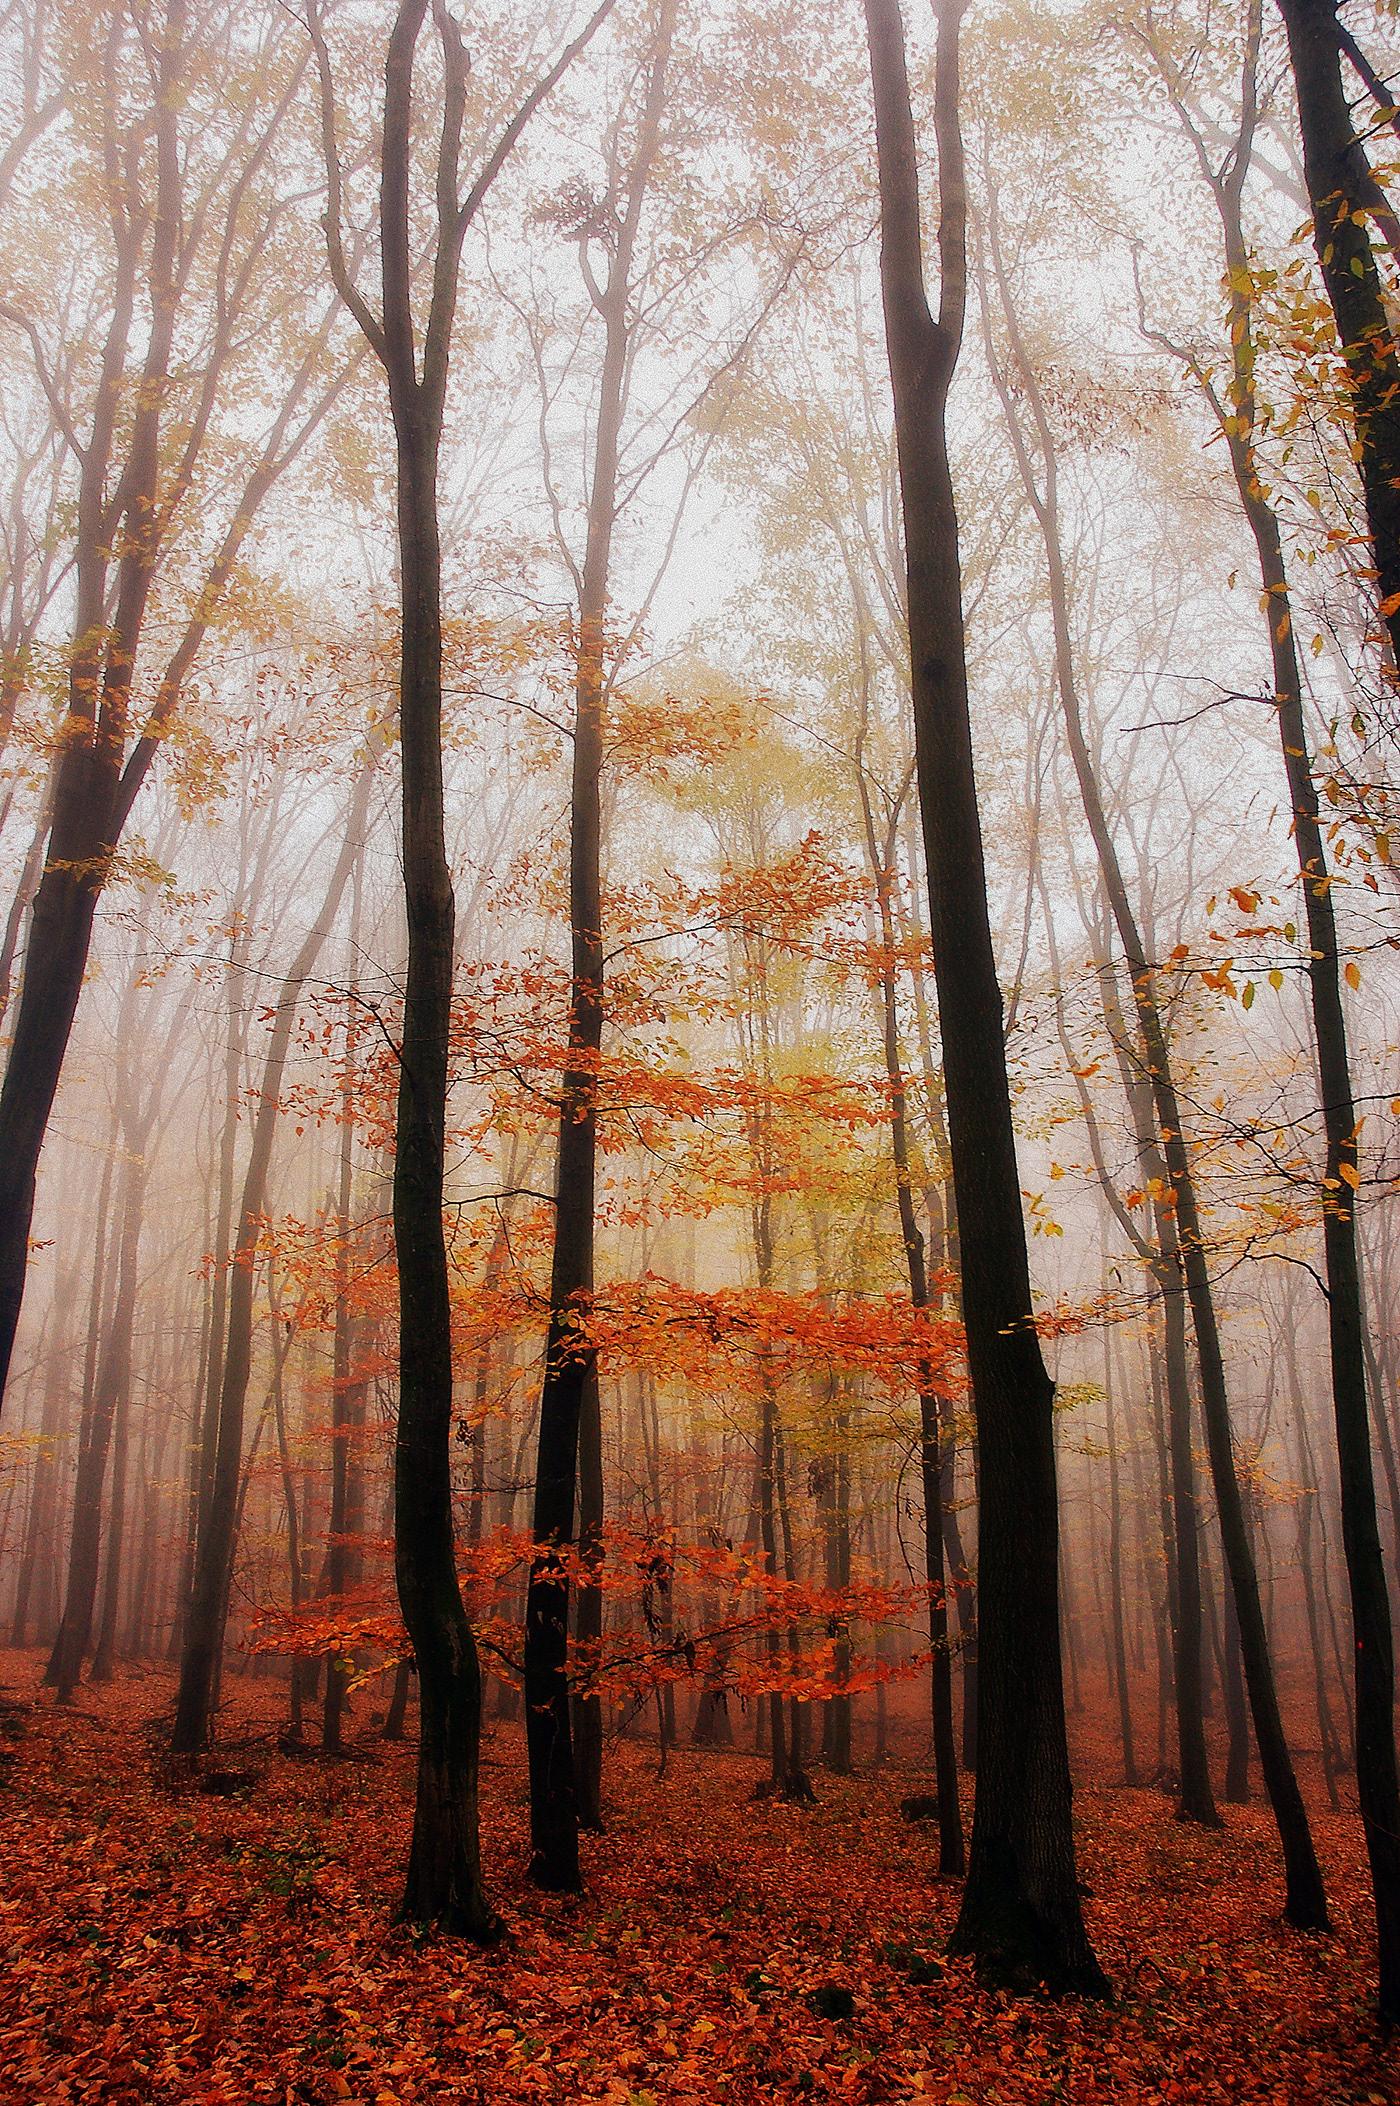 November autumn forest trees colors Carpathians foggy